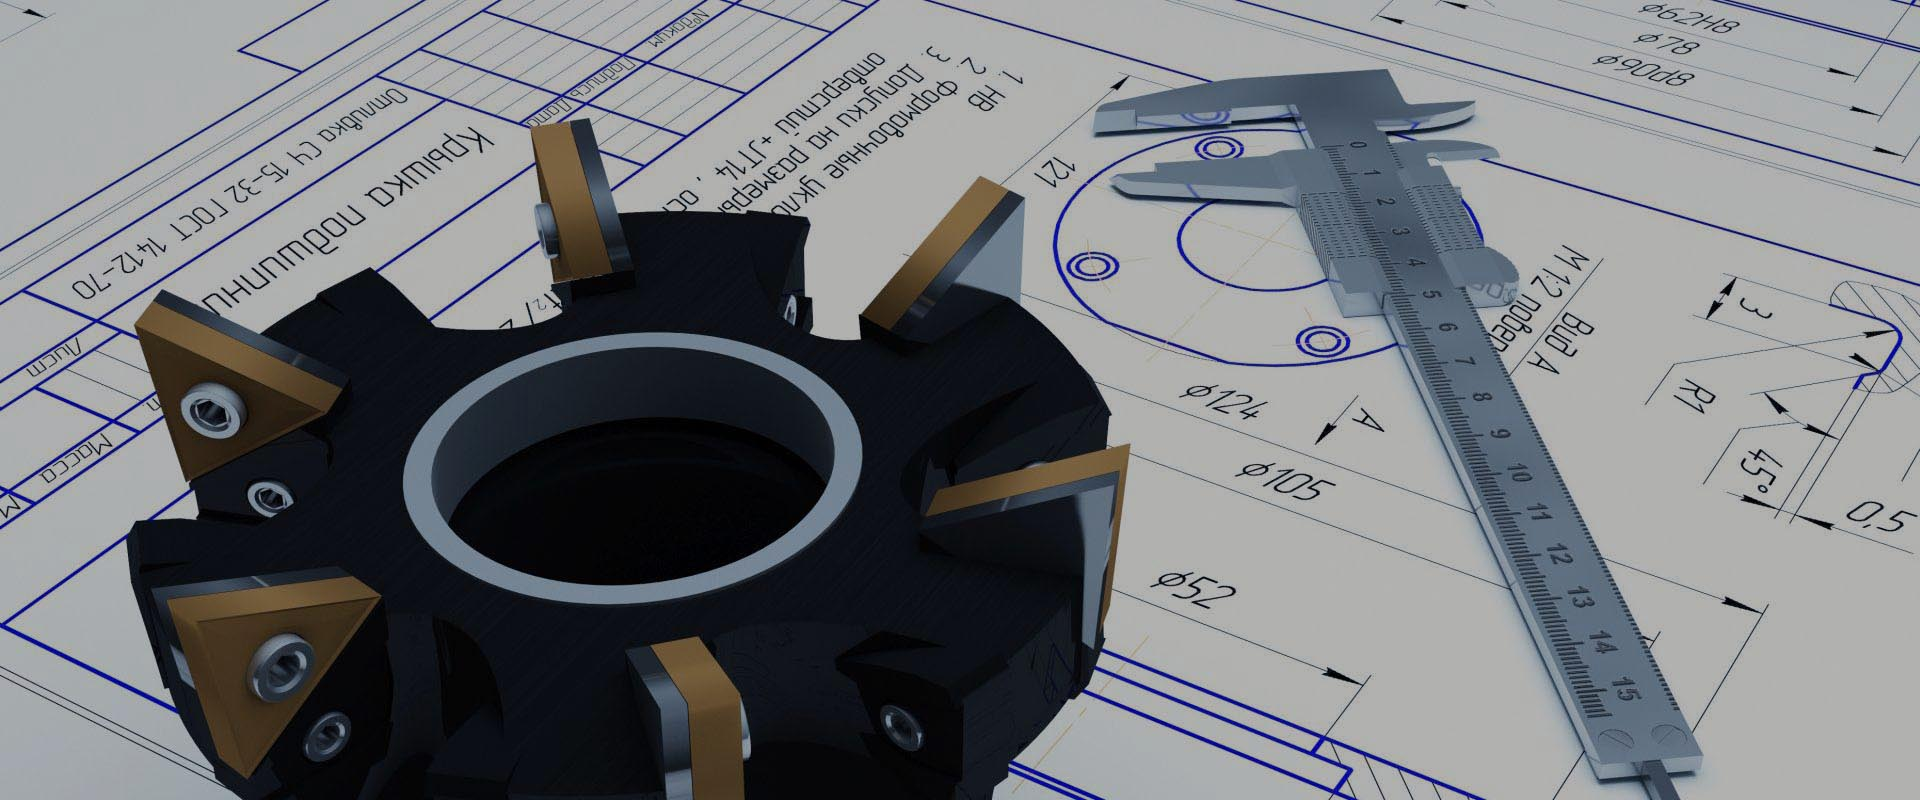 Cnc Obrabeni Cad Konstrukce Cam Programovani Lanskrounsko